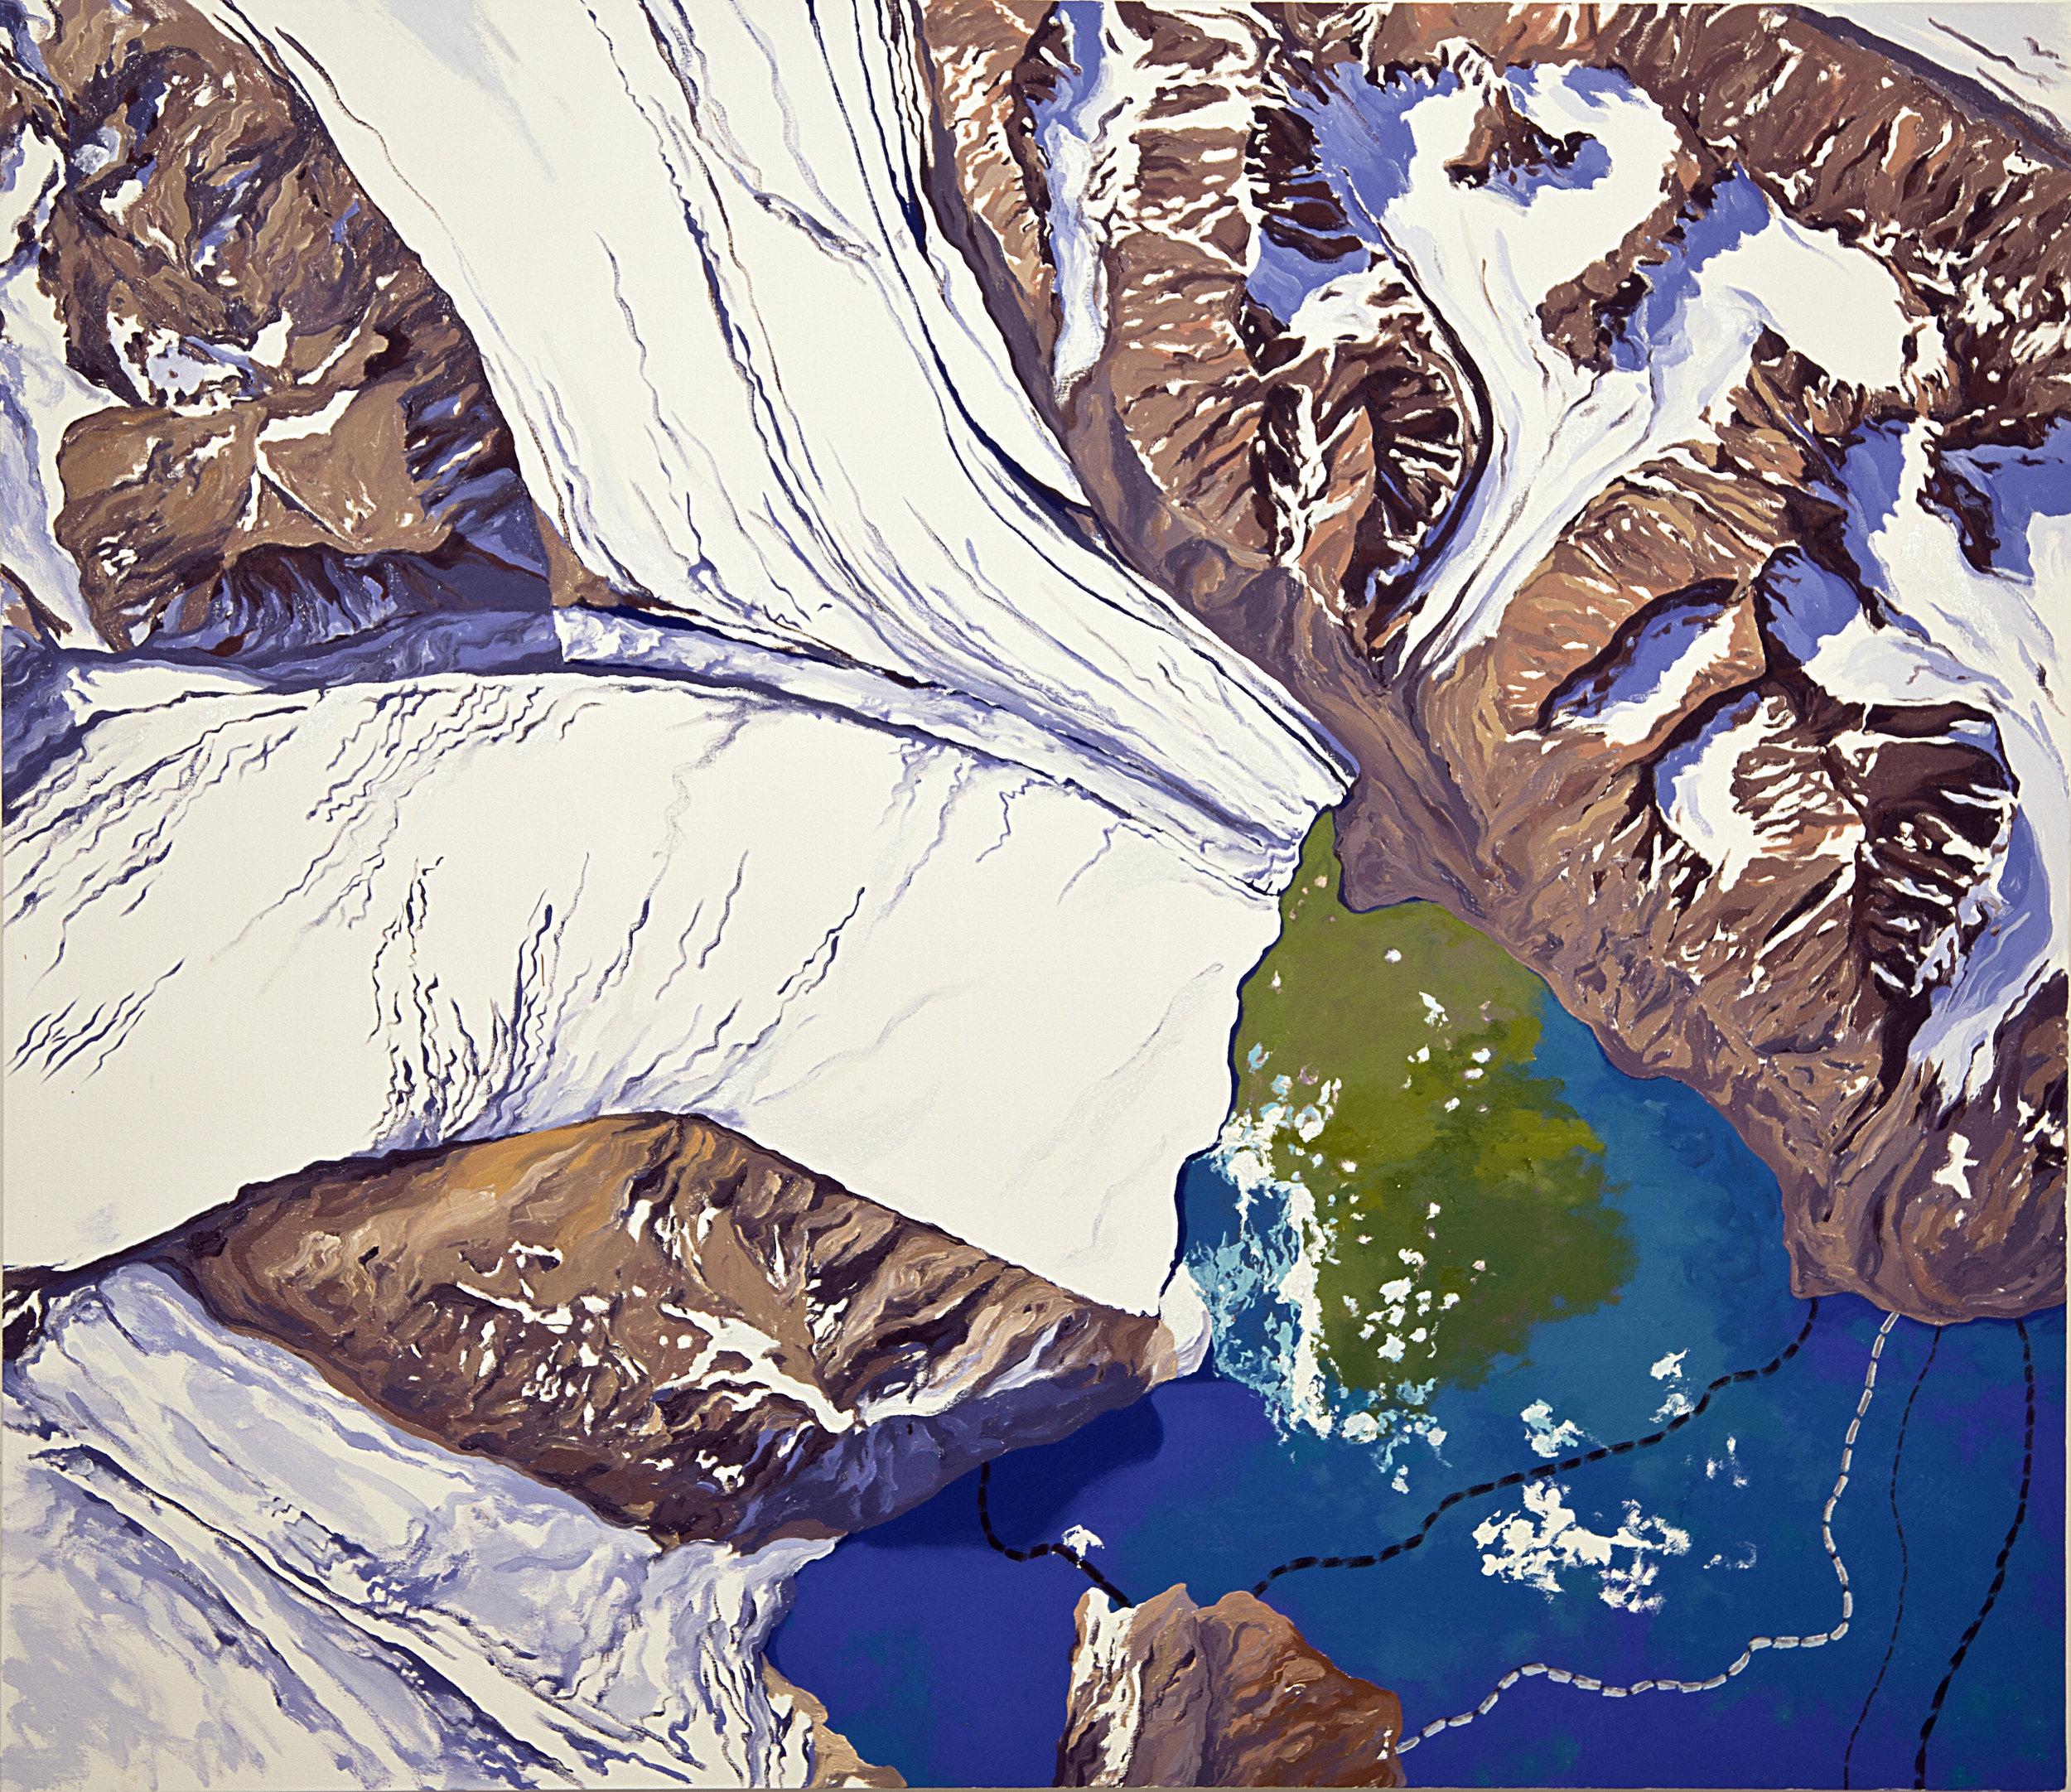 Ortophoto Kongsfjorden 1869-1990 (after NPI)